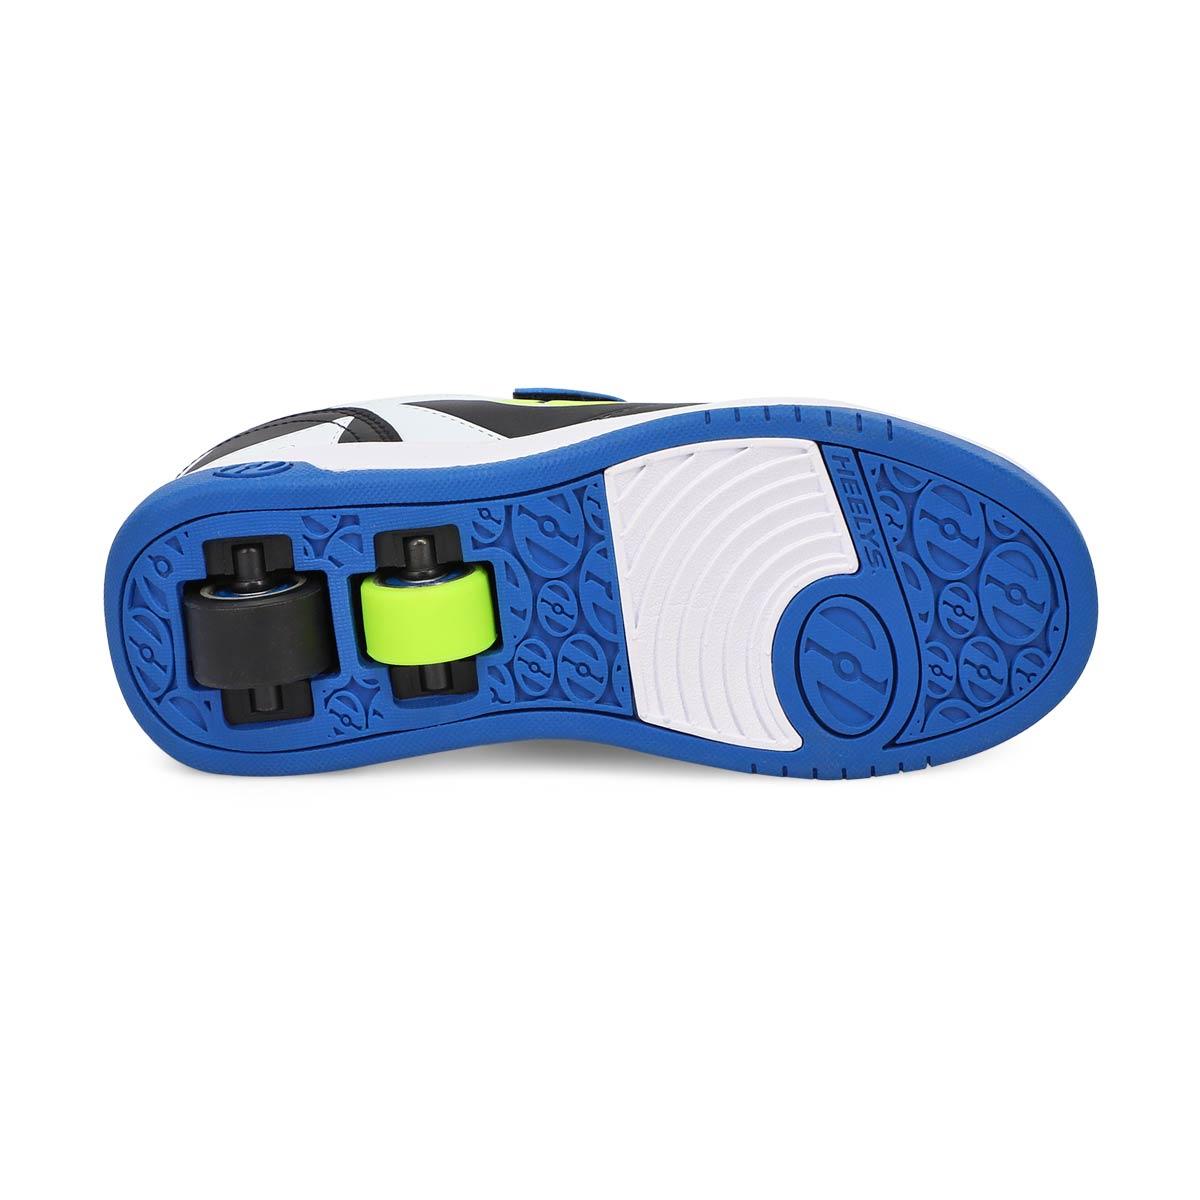 Boy's Dual Up x2 skate sneaker -  Blk/Blue/Wht